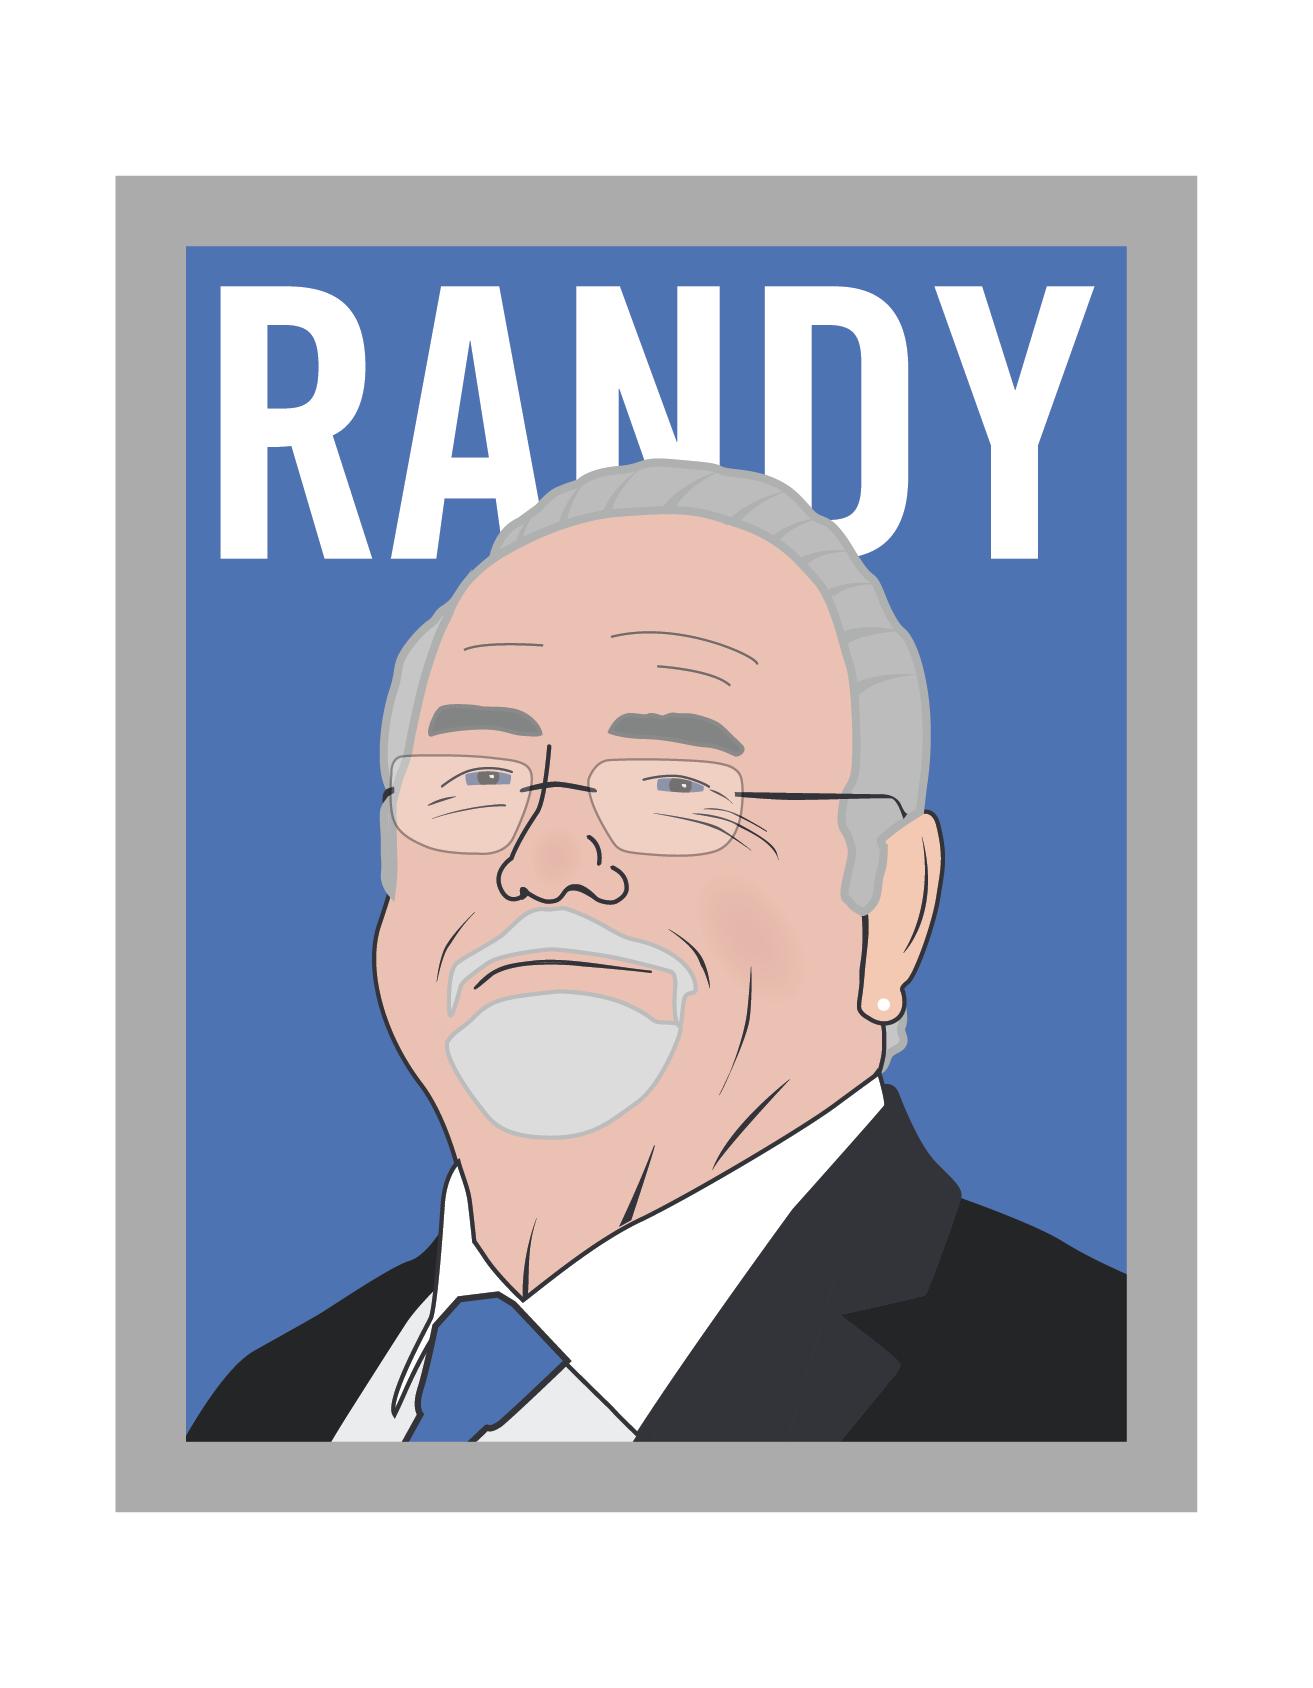 randy-02.png